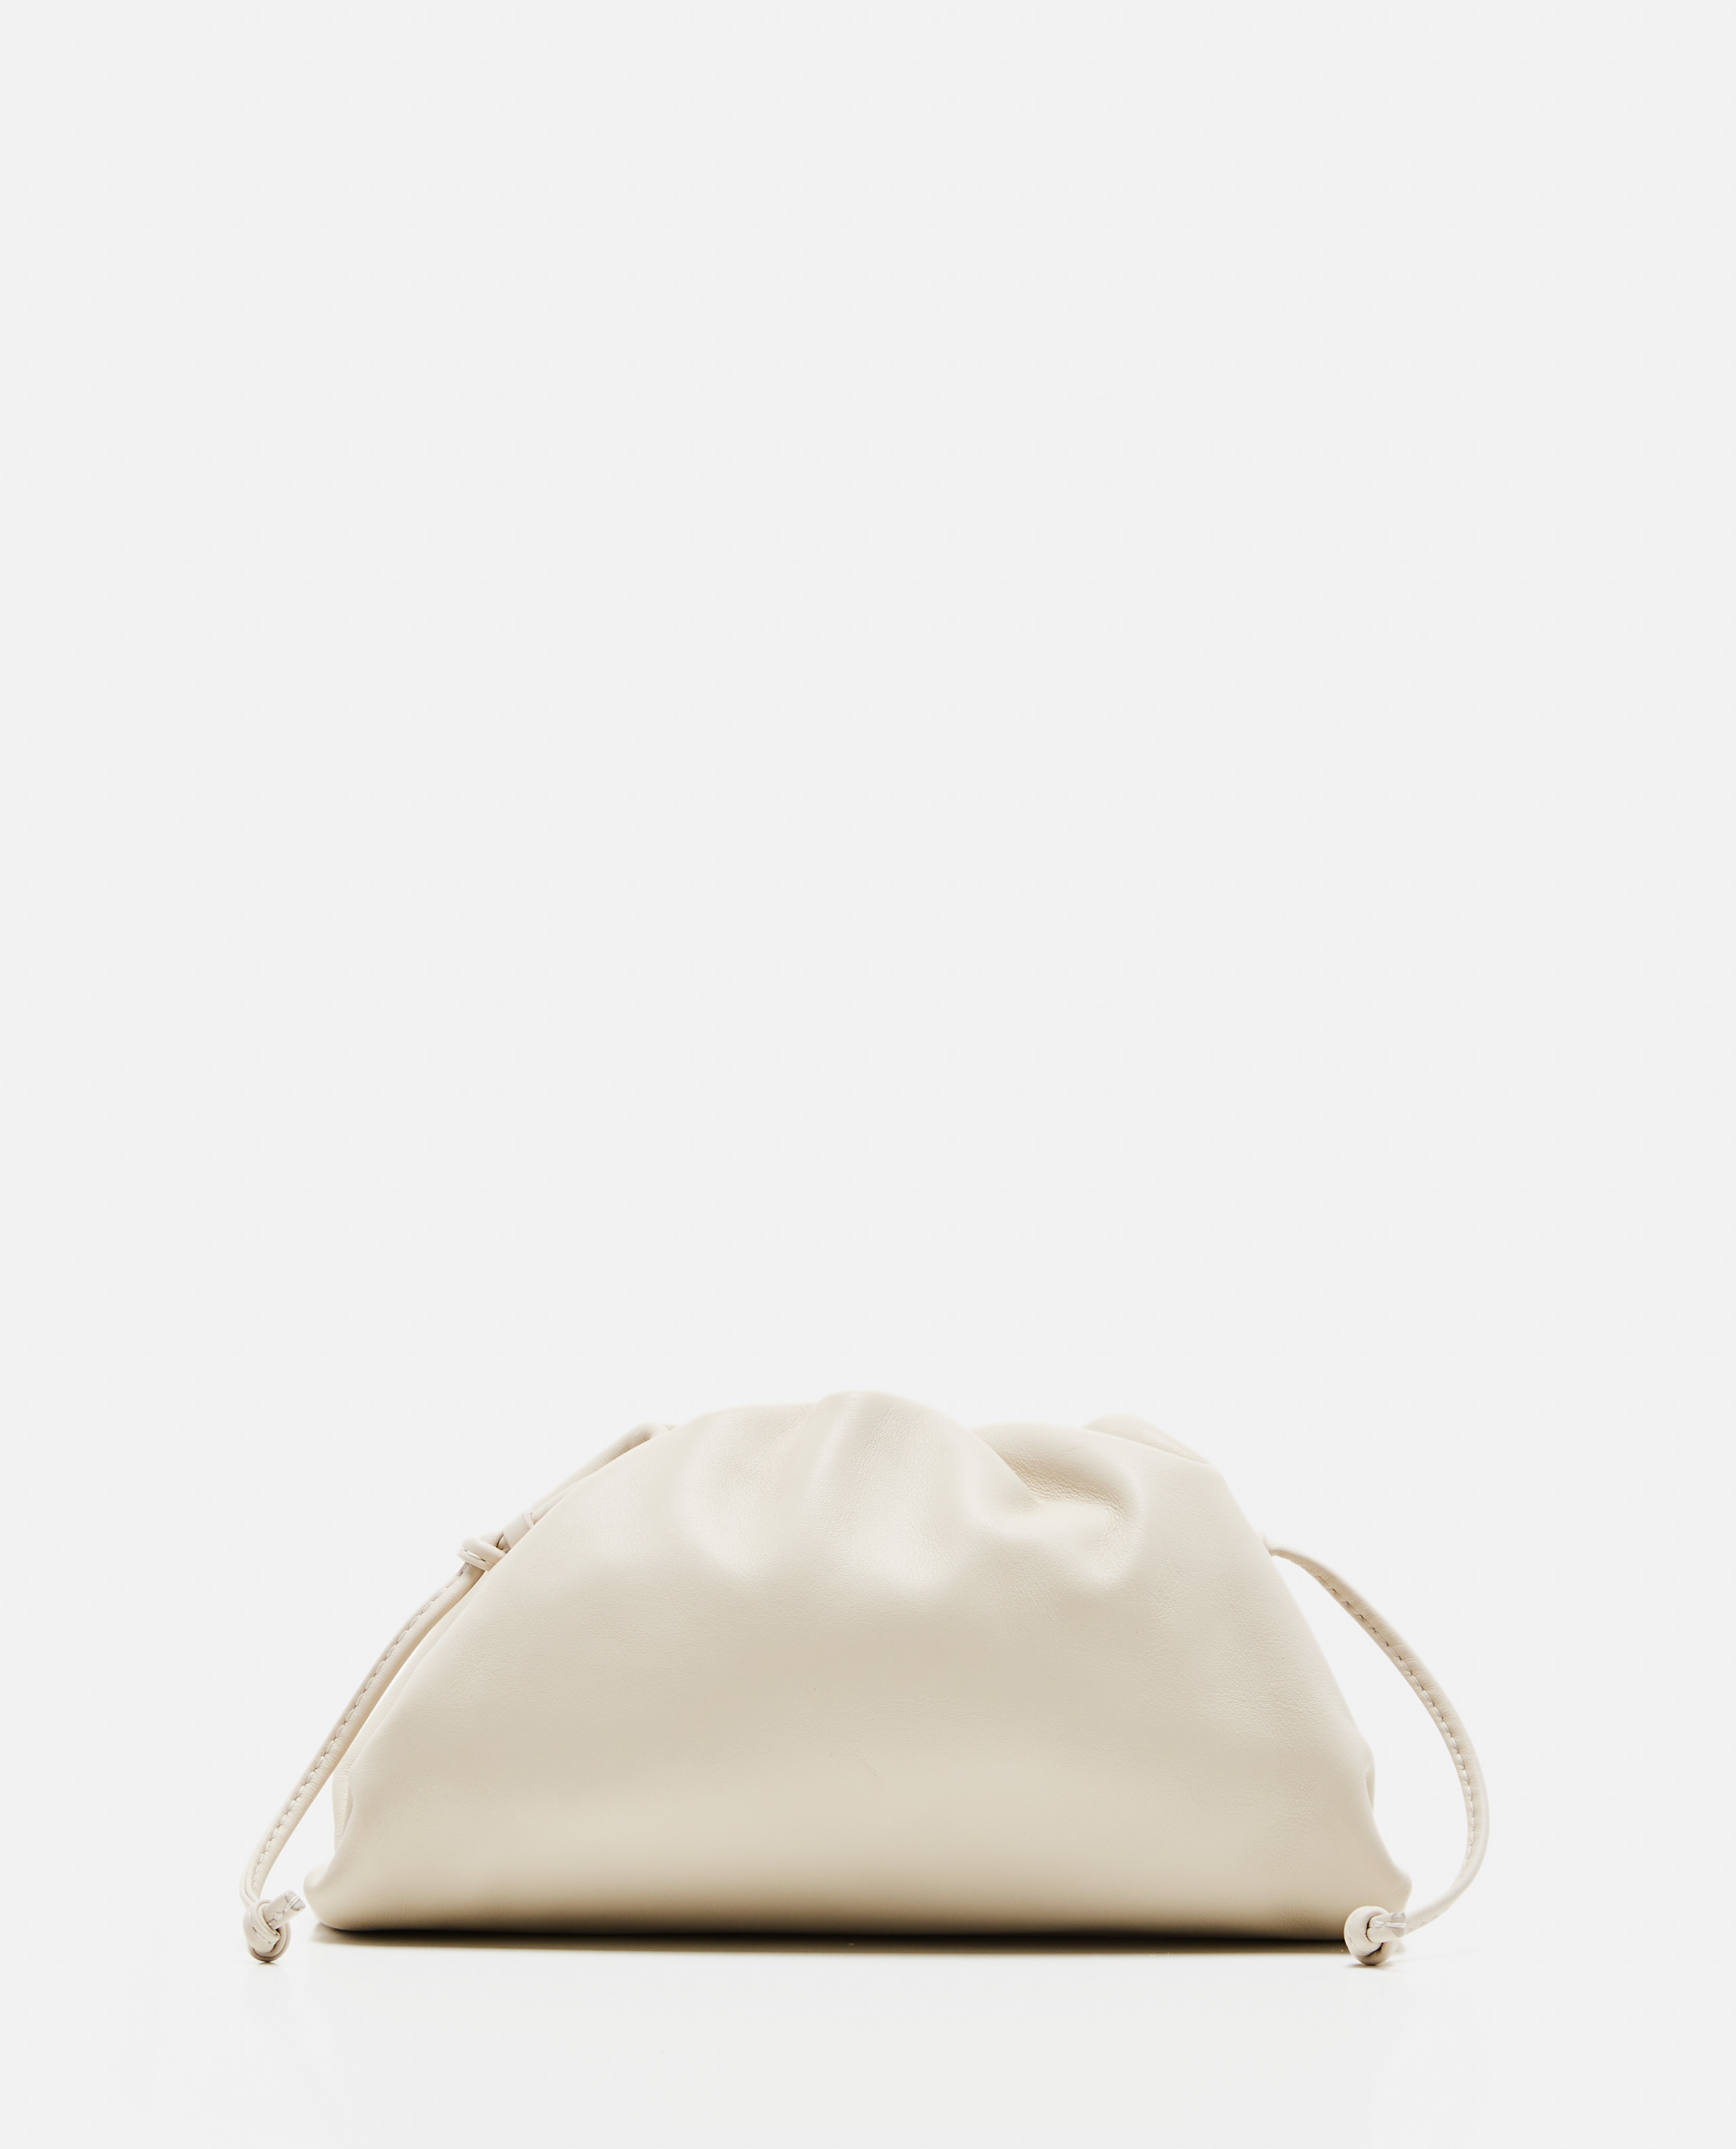 The Pouch 20 mini bag